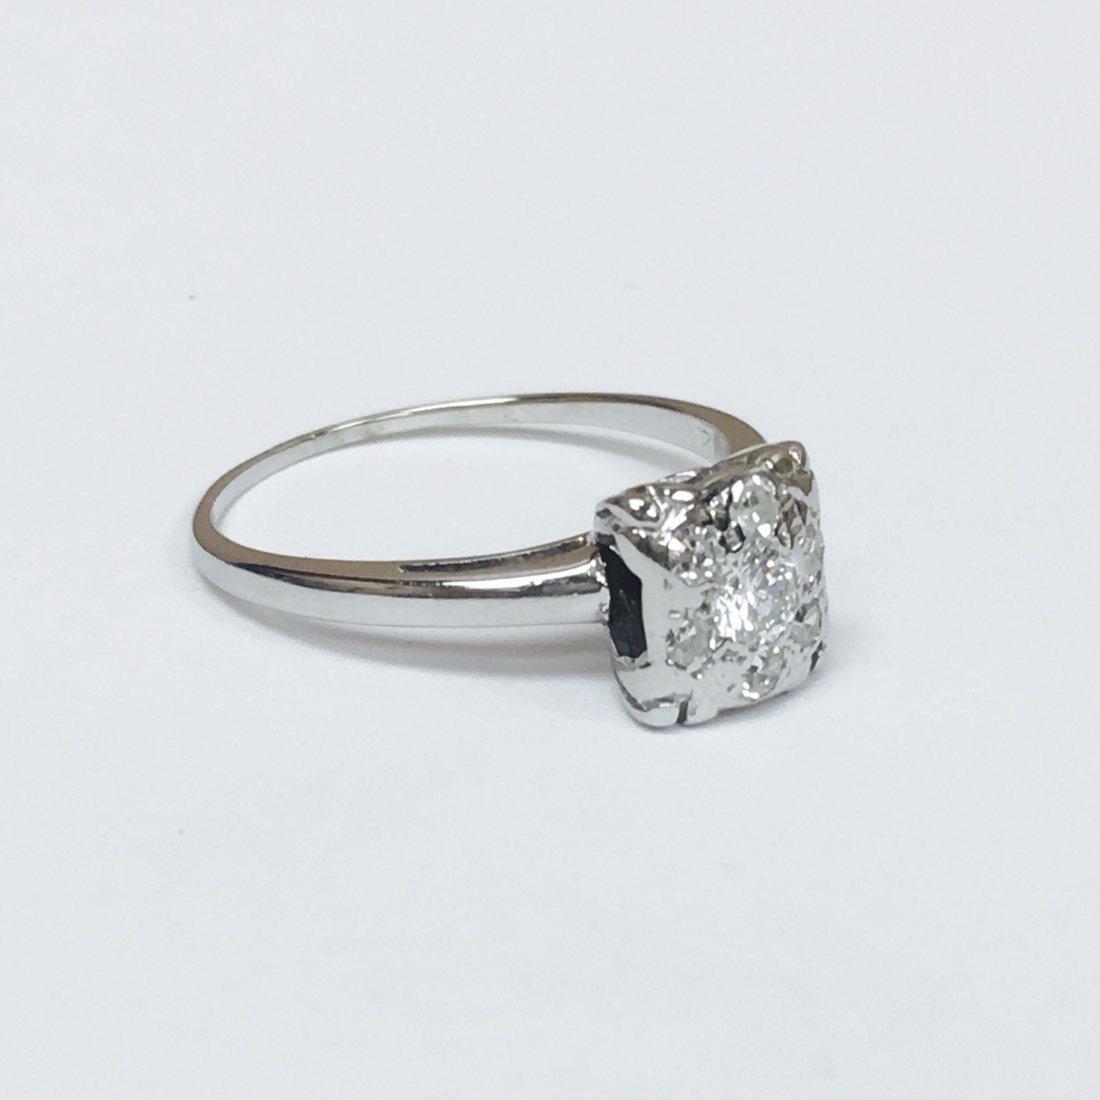 14K White Gold, VVS Clarity Diamond Ring - 2